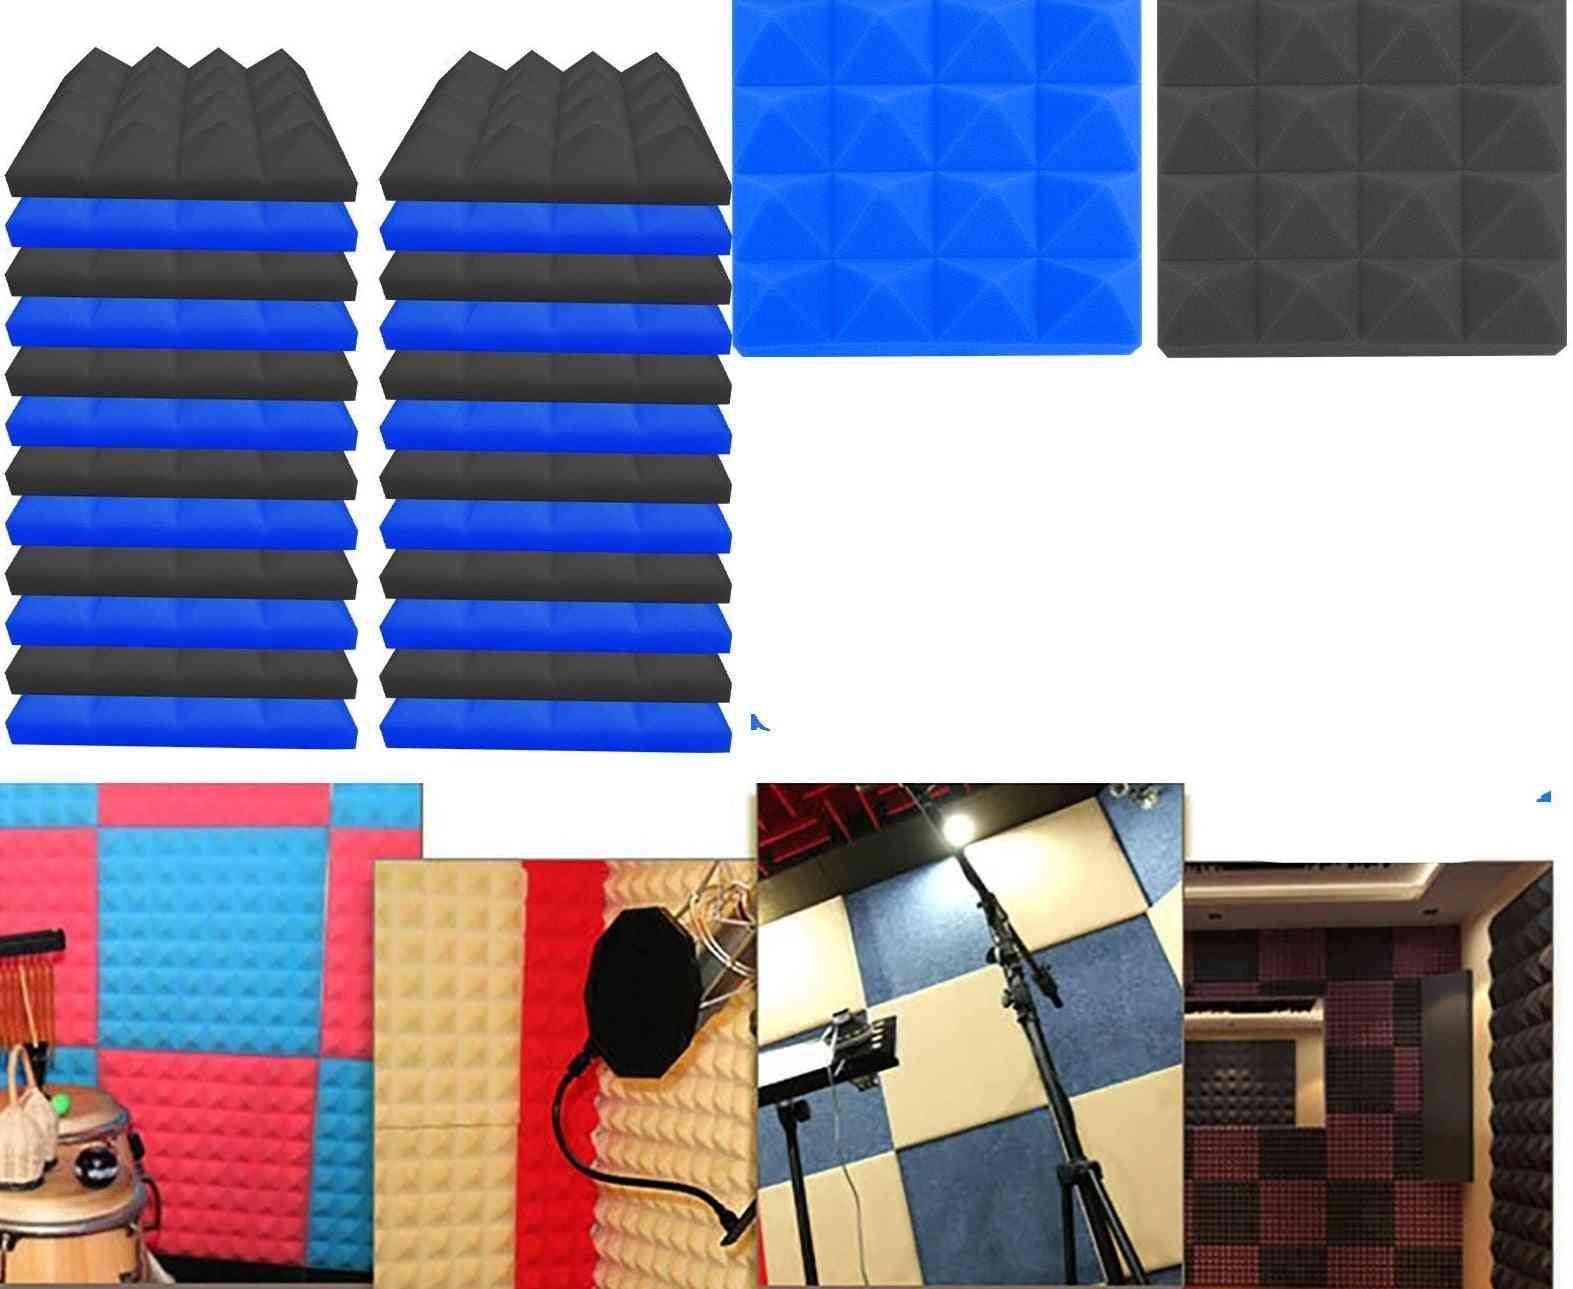 Studio Acoustic Sound Proofing Protective Sponge Treatment Panel